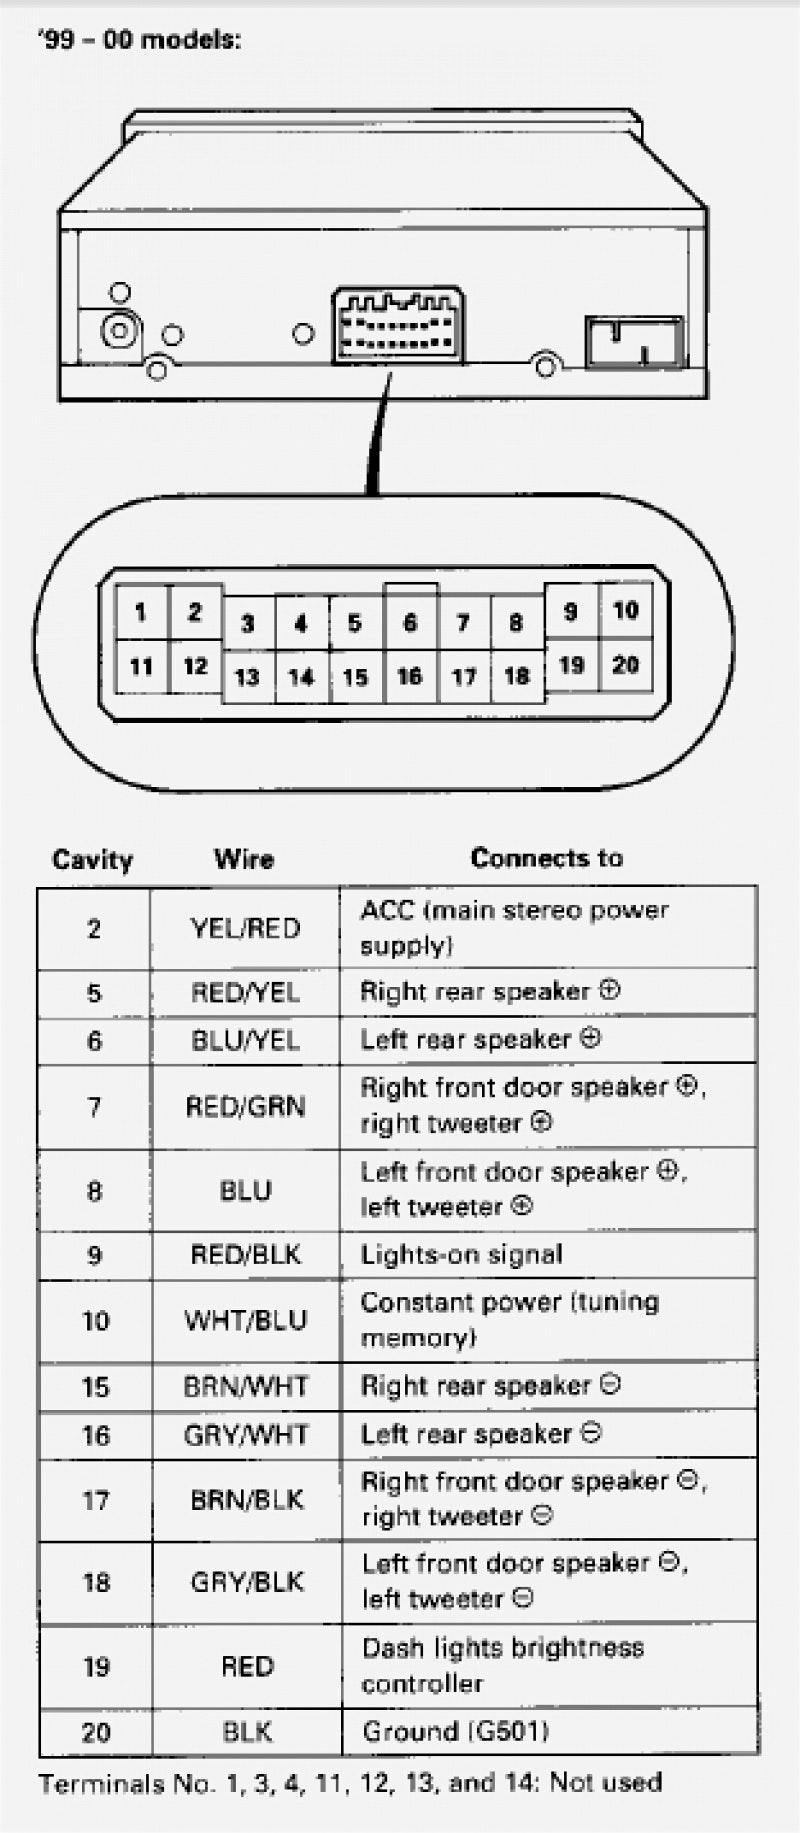 [DIAGRAM_4FR]  AR_9417] Radio Wiring Harness Diagram Pioneer Car Stereo Wiring Harness  Download Diagram | Jvc Deck Wiring Diagram |  | Anist Groa Mohammedshrine Librar Wiring 101